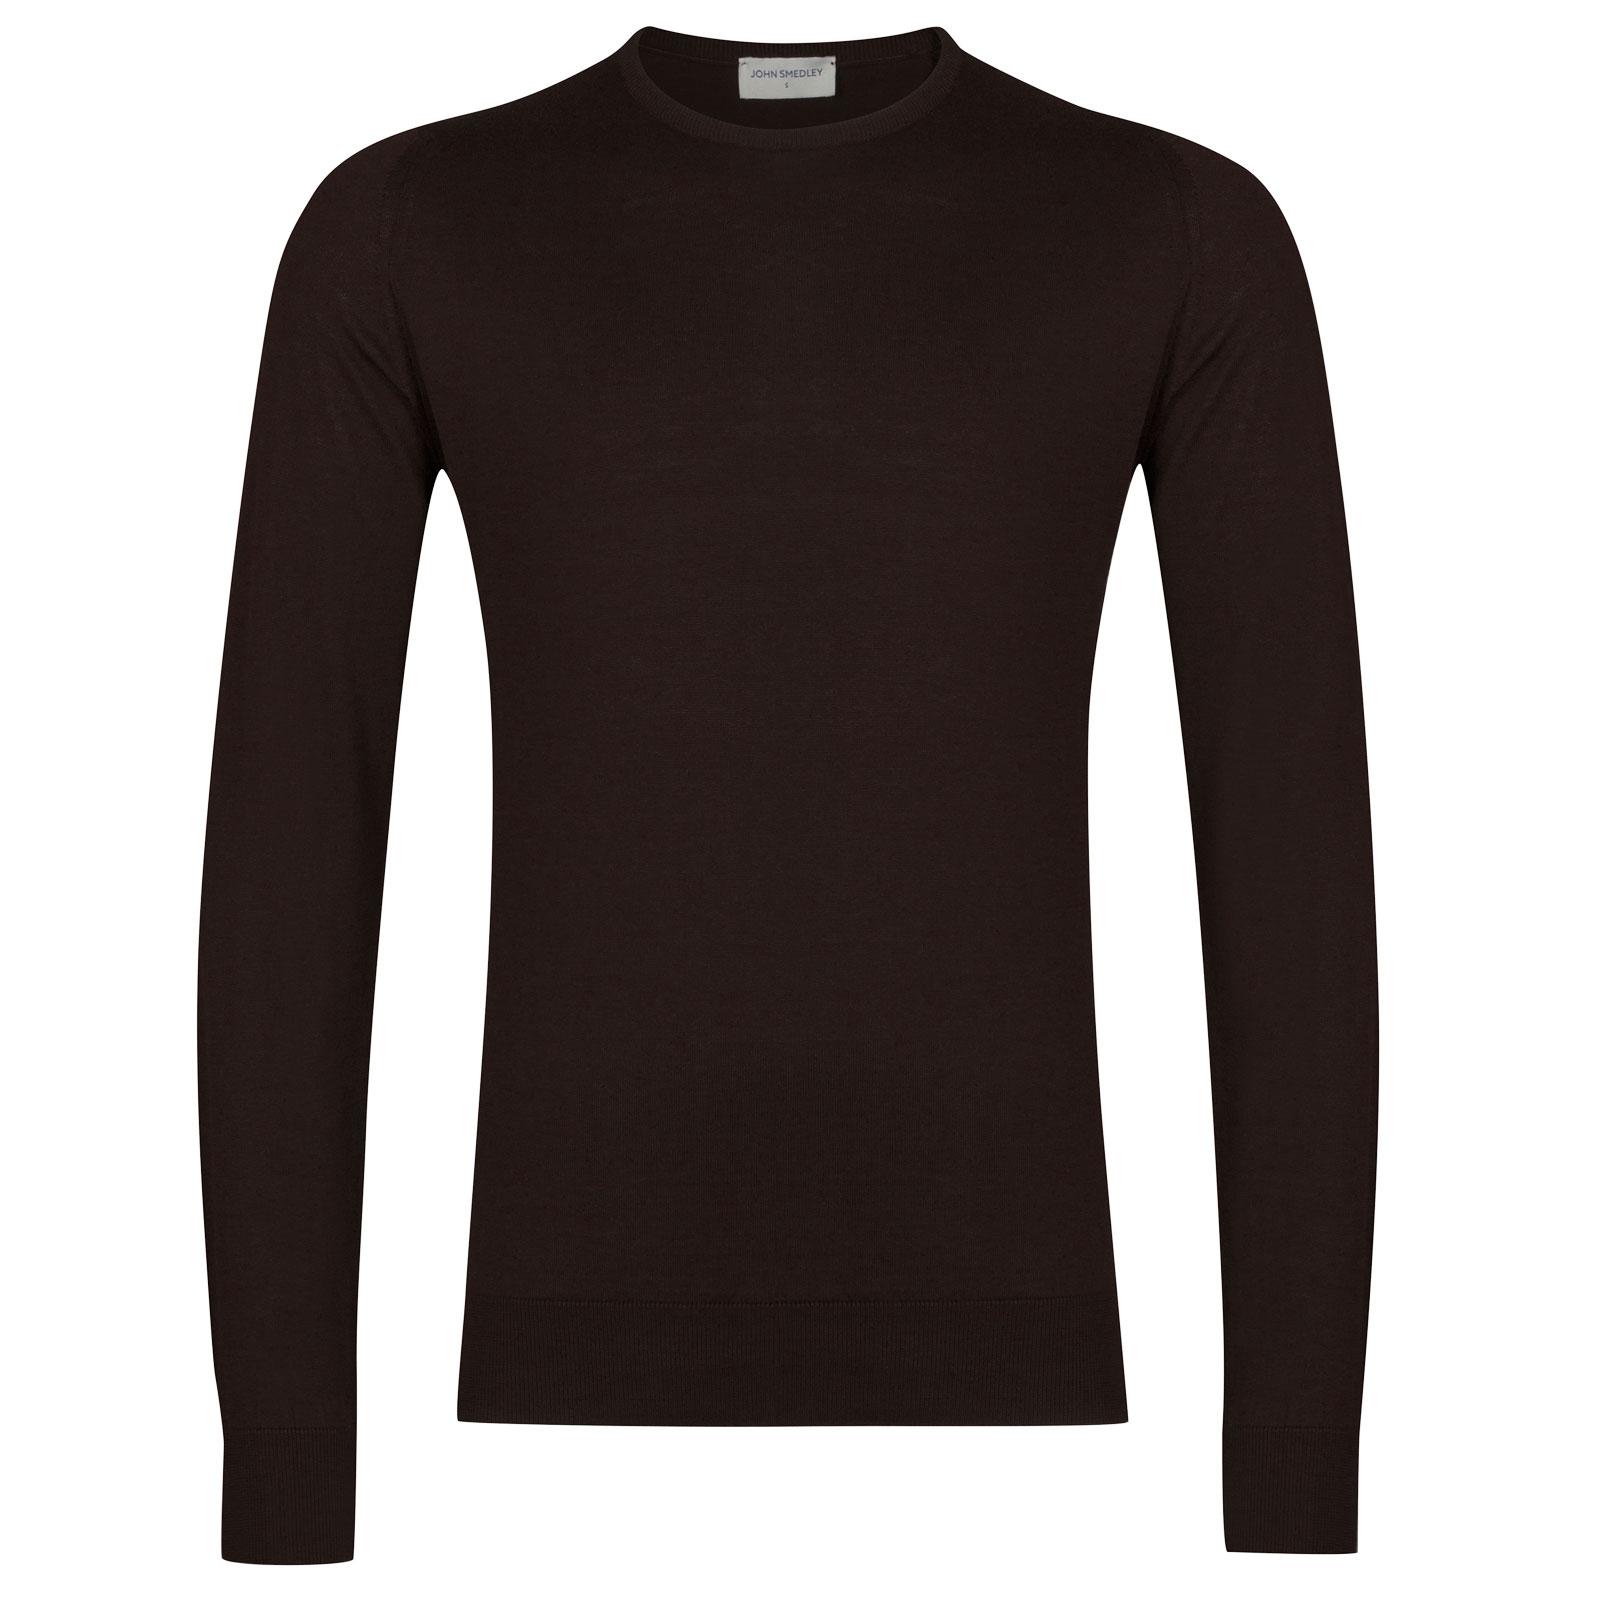 John Smedley HatfieldSea Island Cotton Pullover in Dark Leather-S